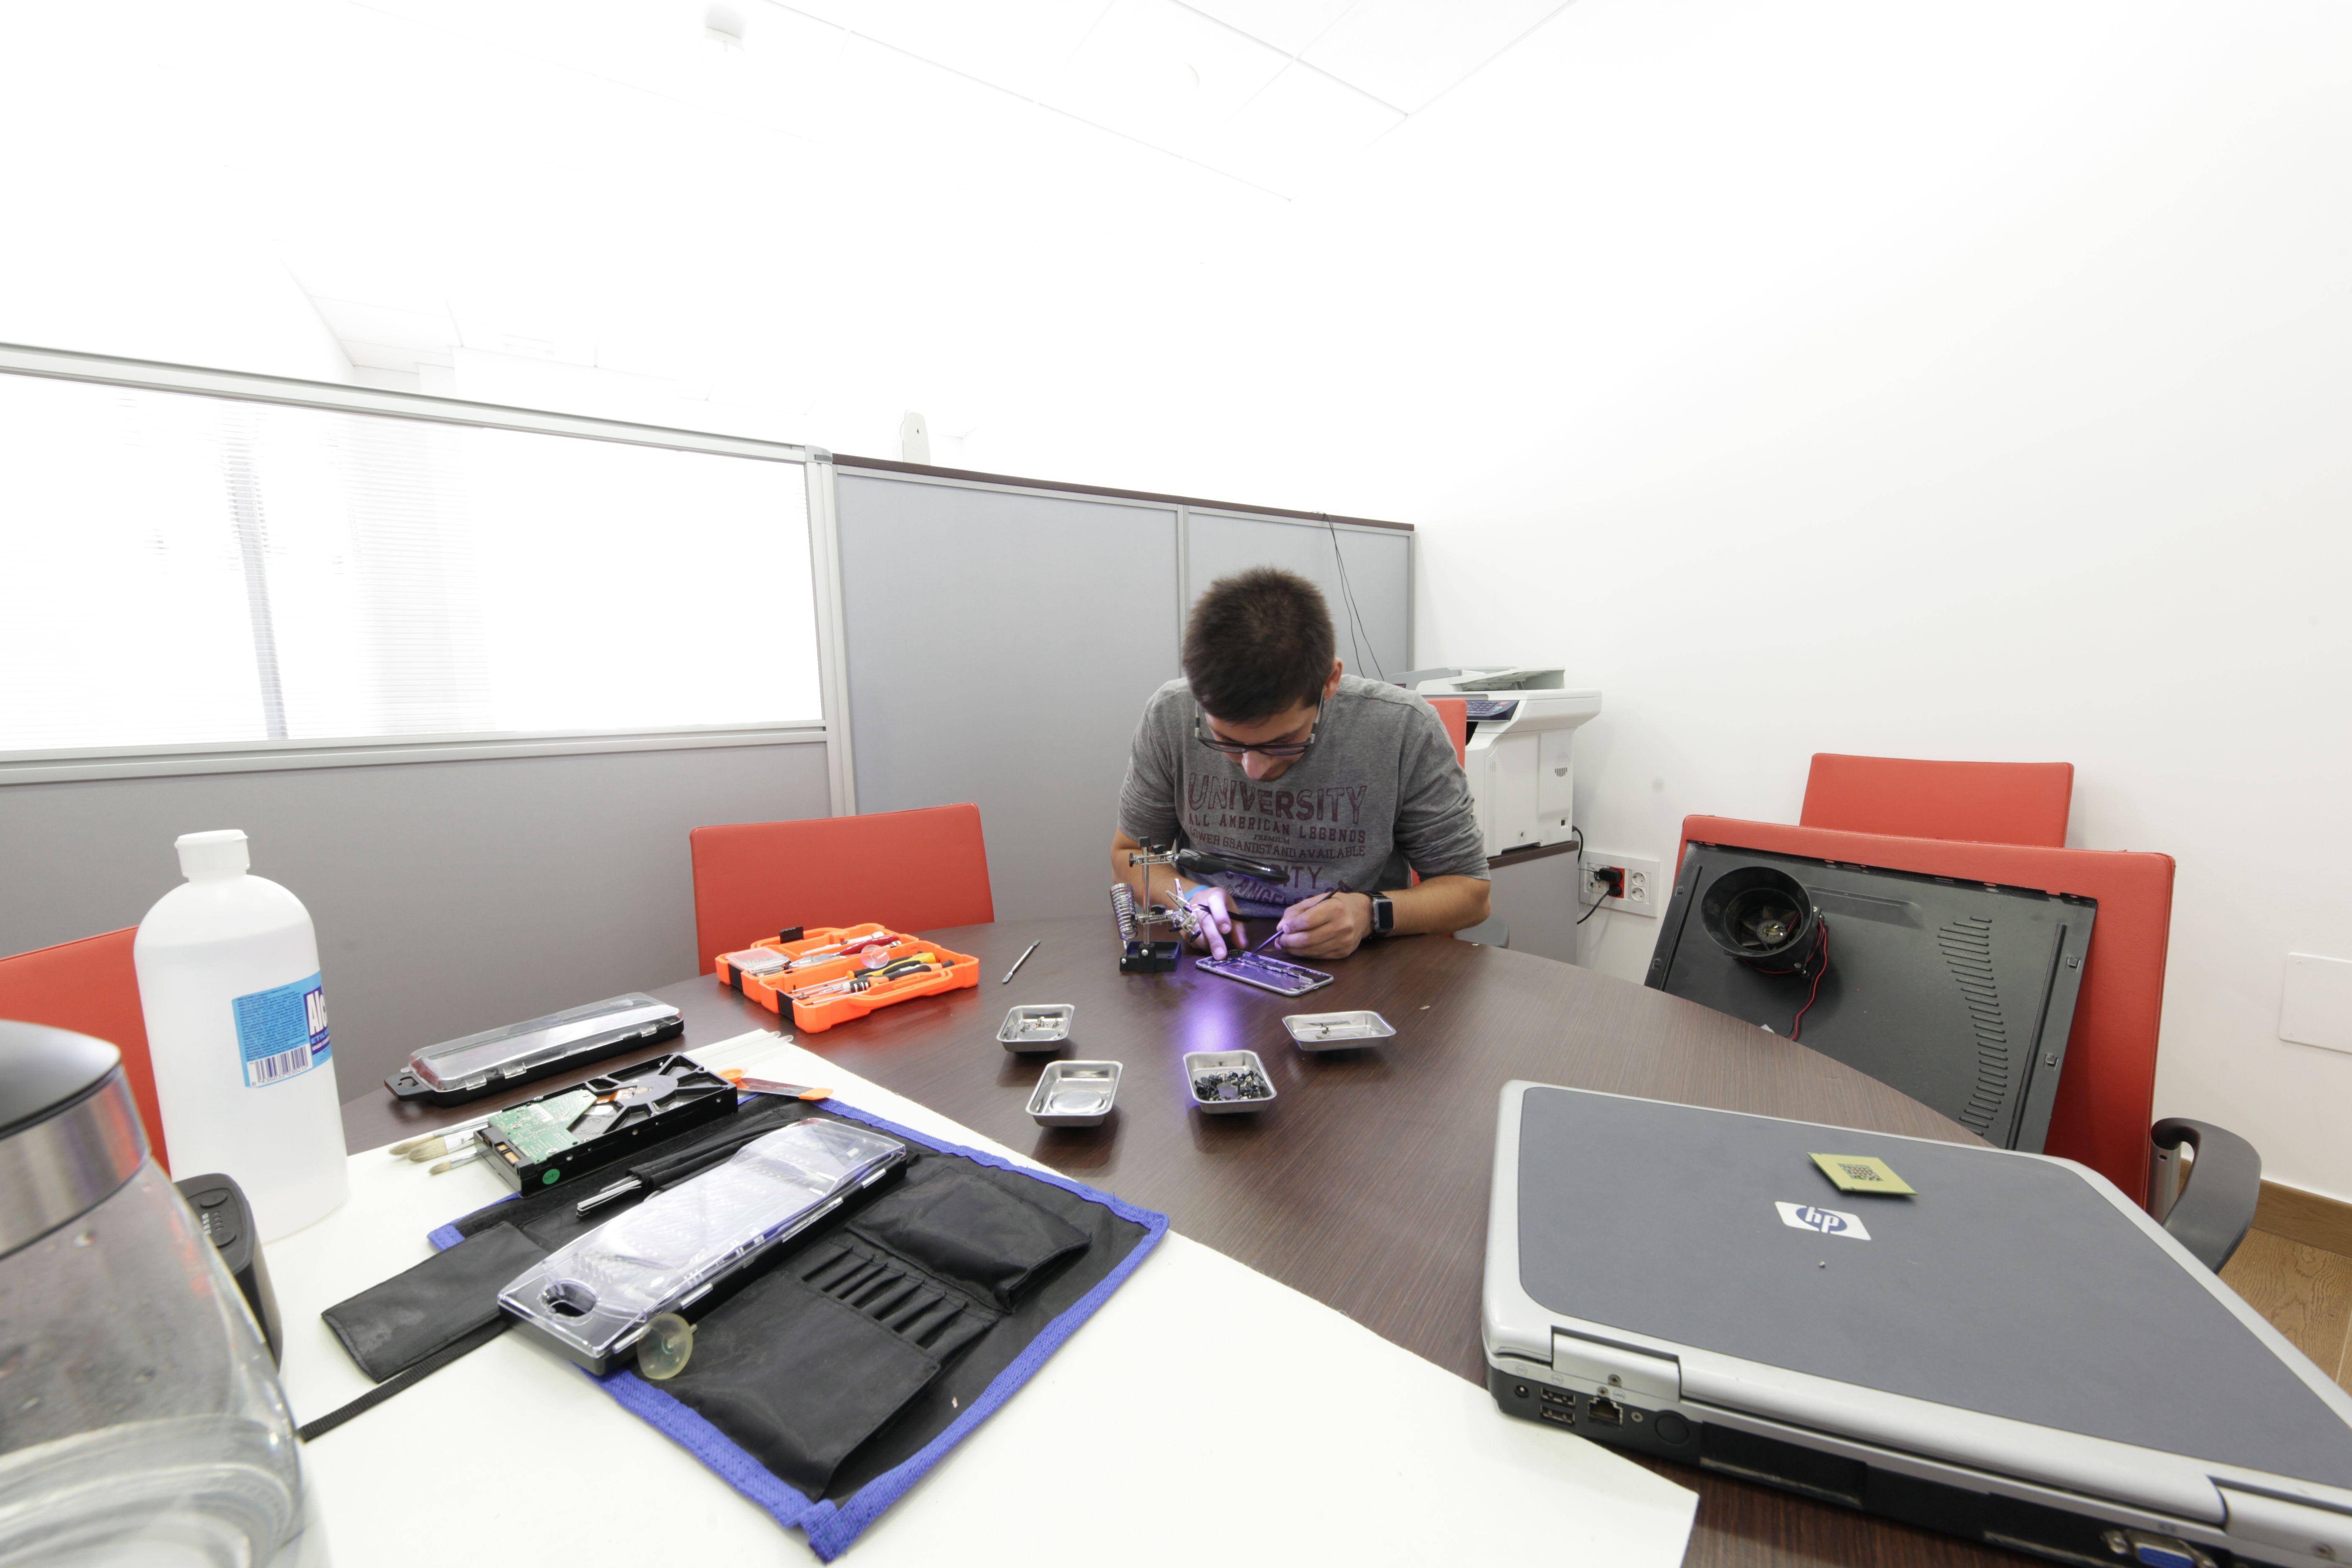 Contamos con un equipo de técnicos expertos en las averías informáticas